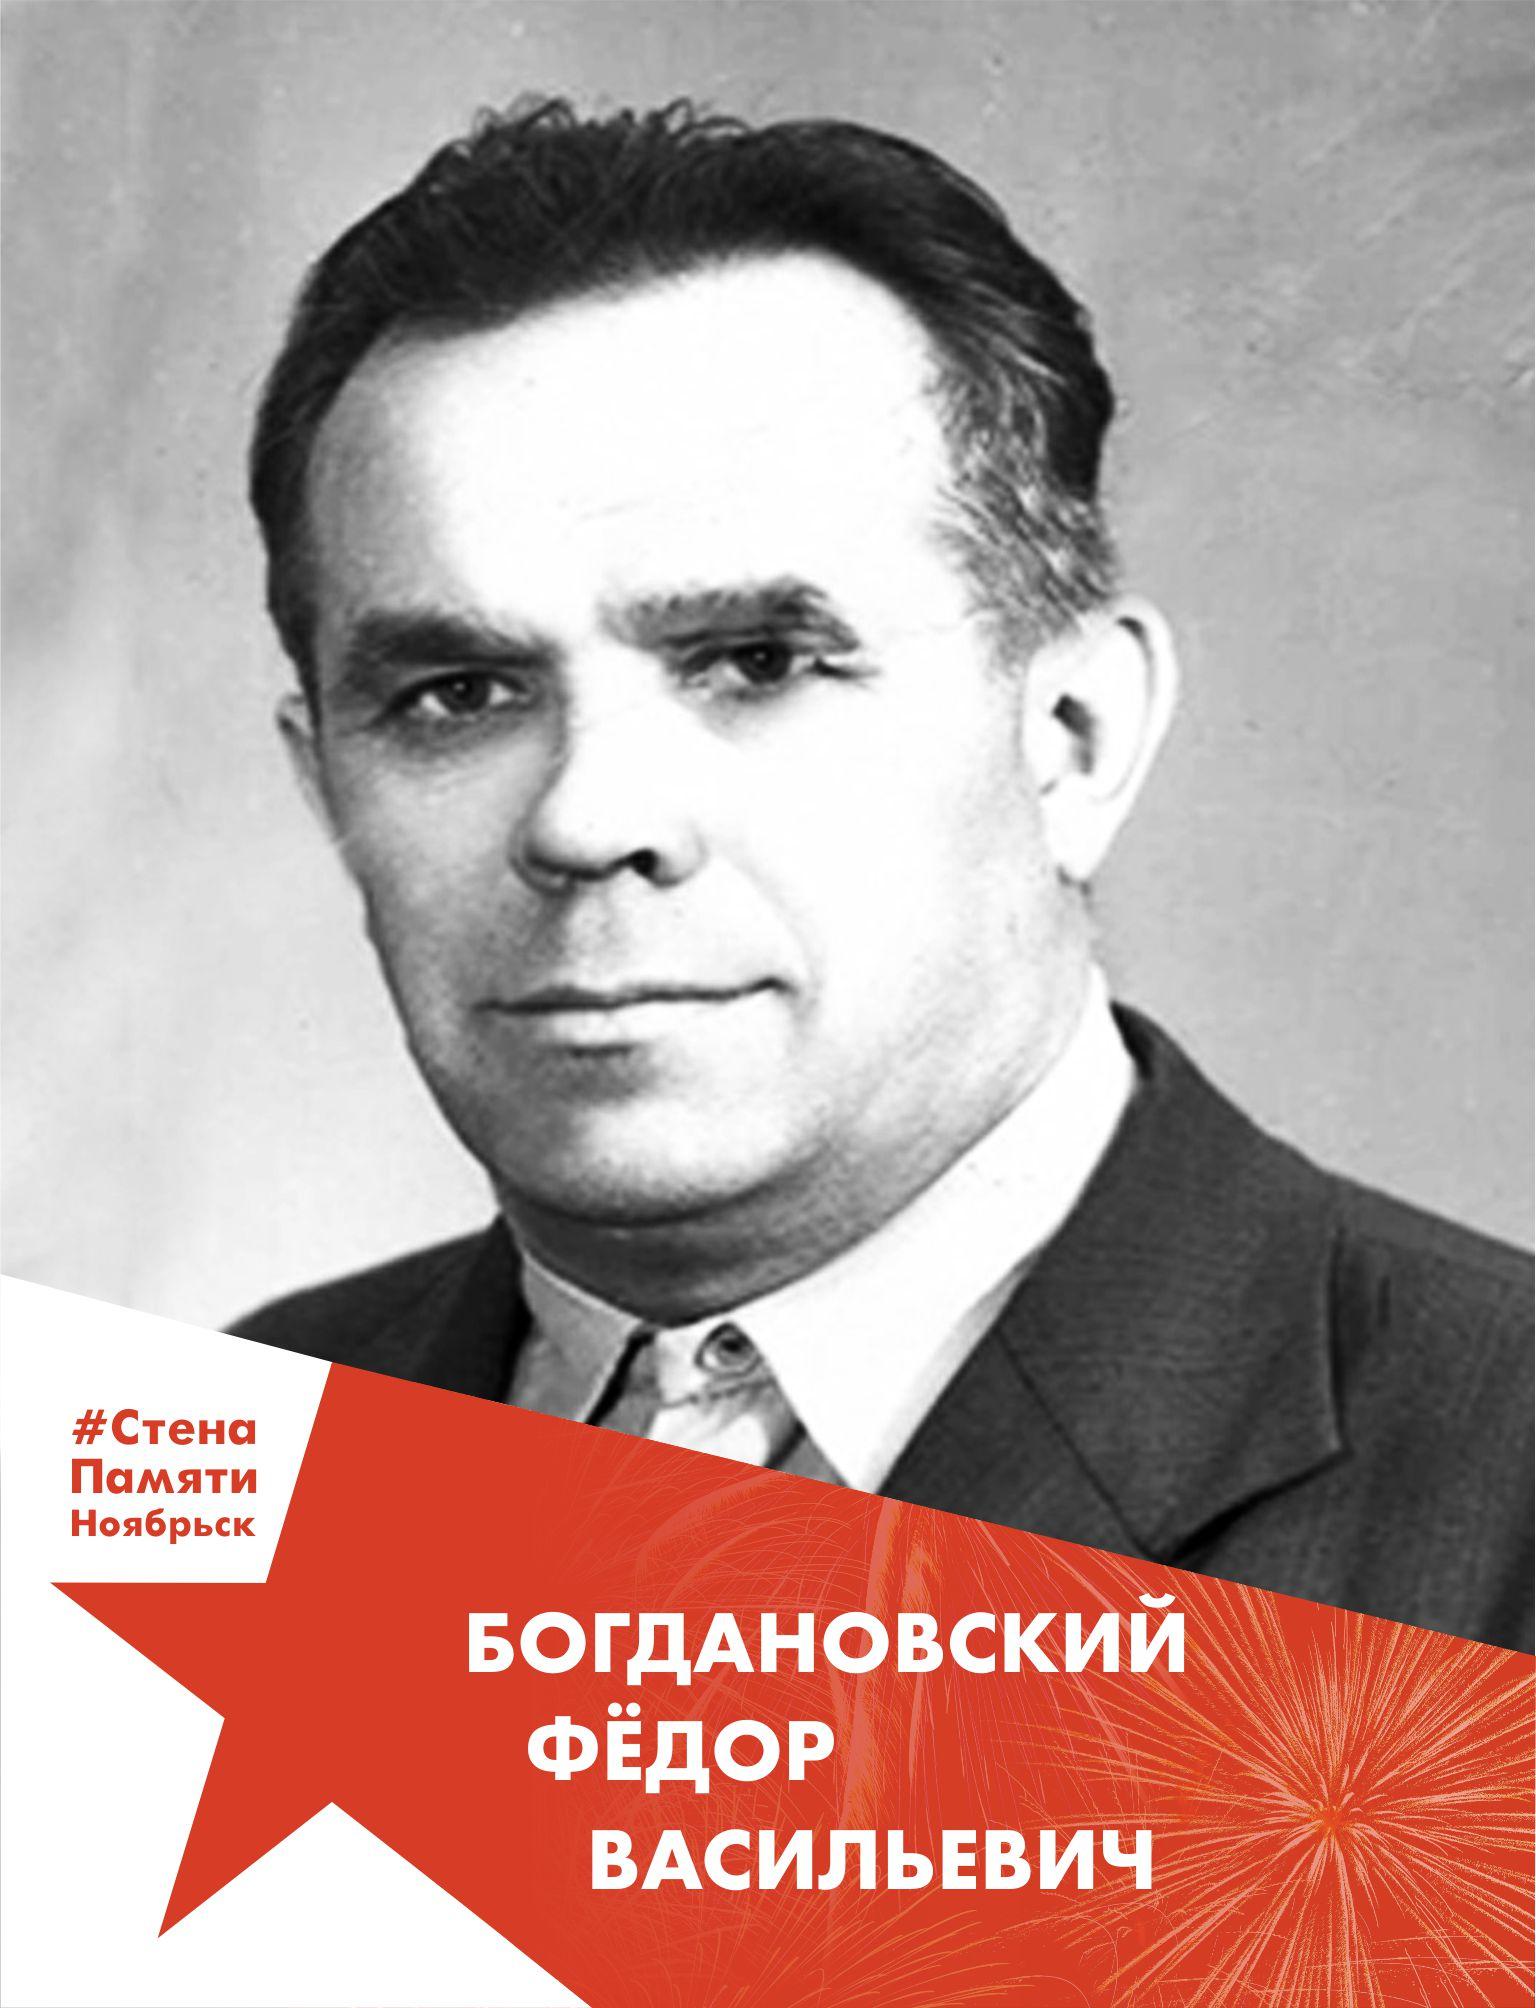 Богдановский Фёдор Васильевич